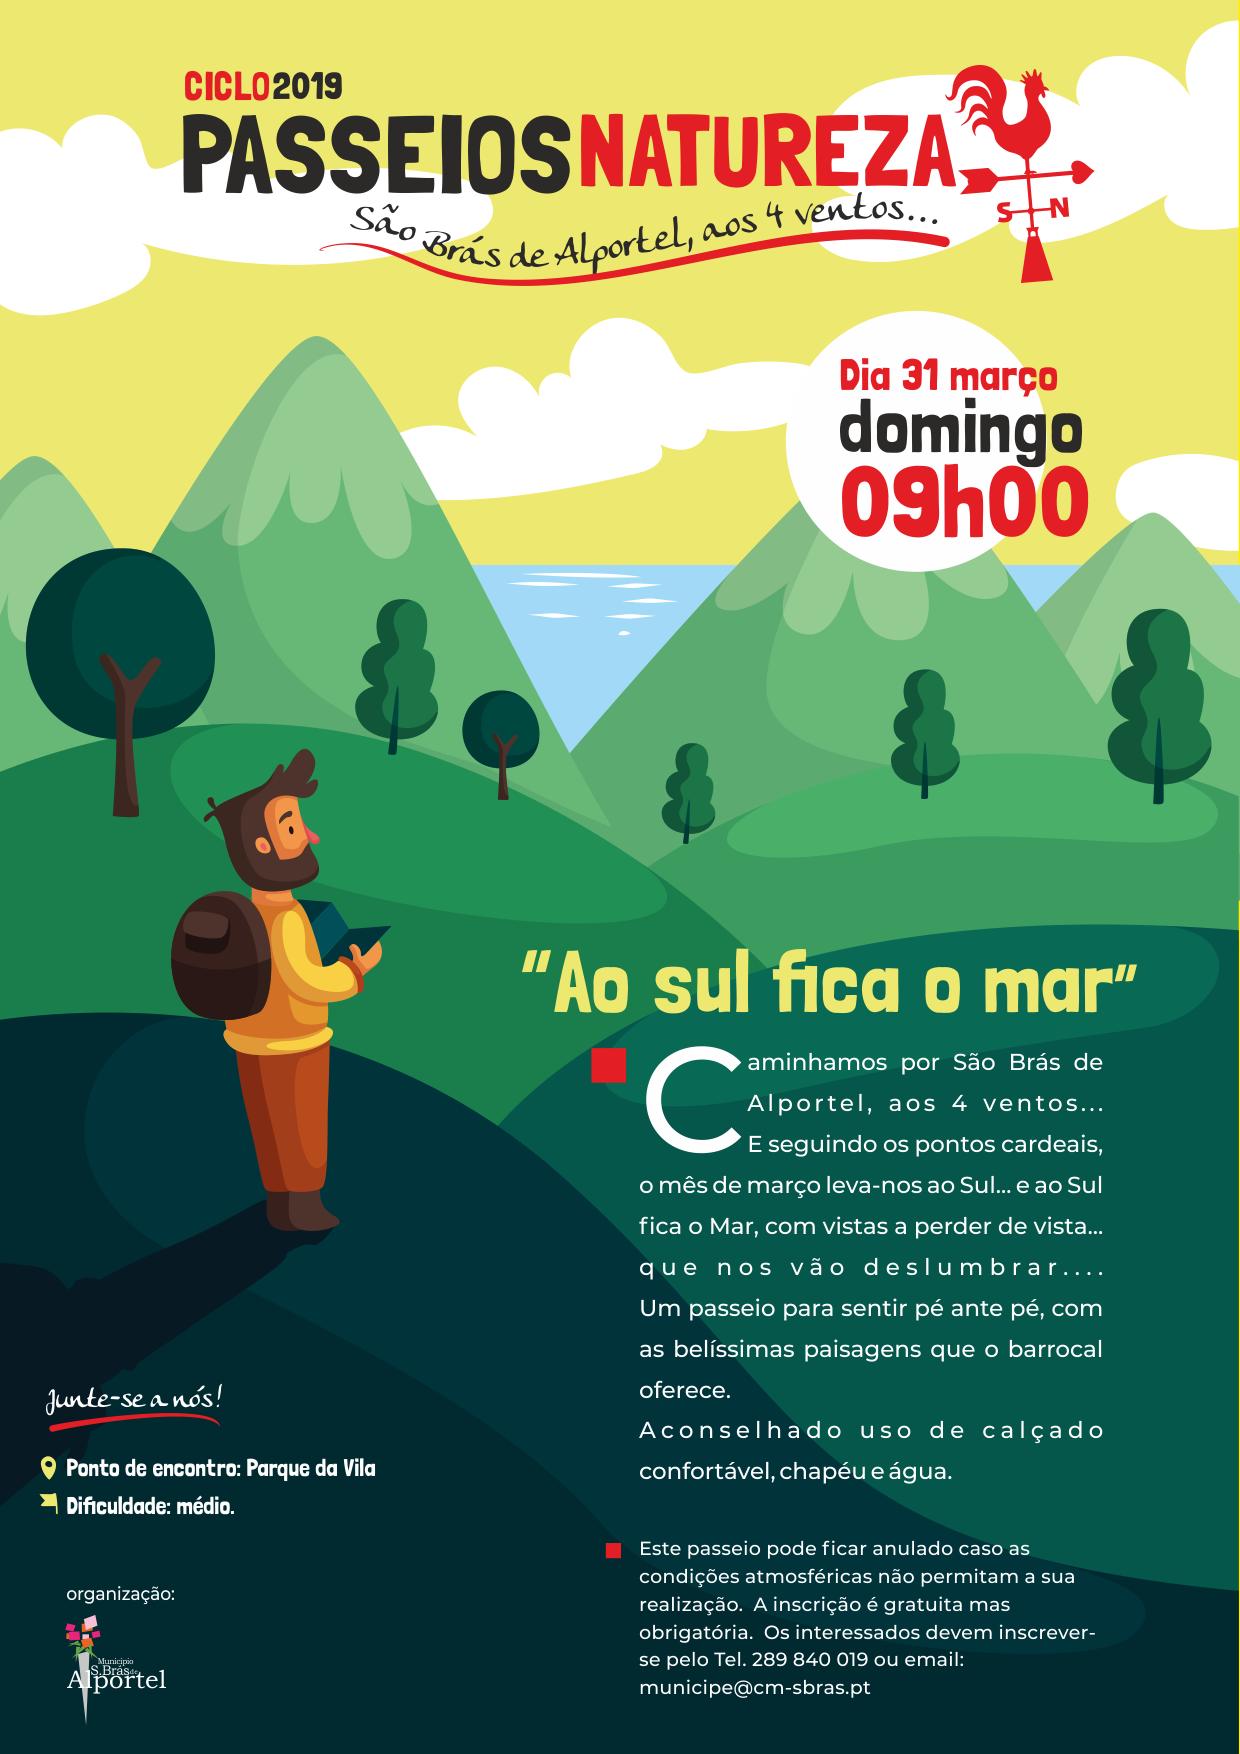 cartaz do ciclo de passeios natureza de marco de 2019